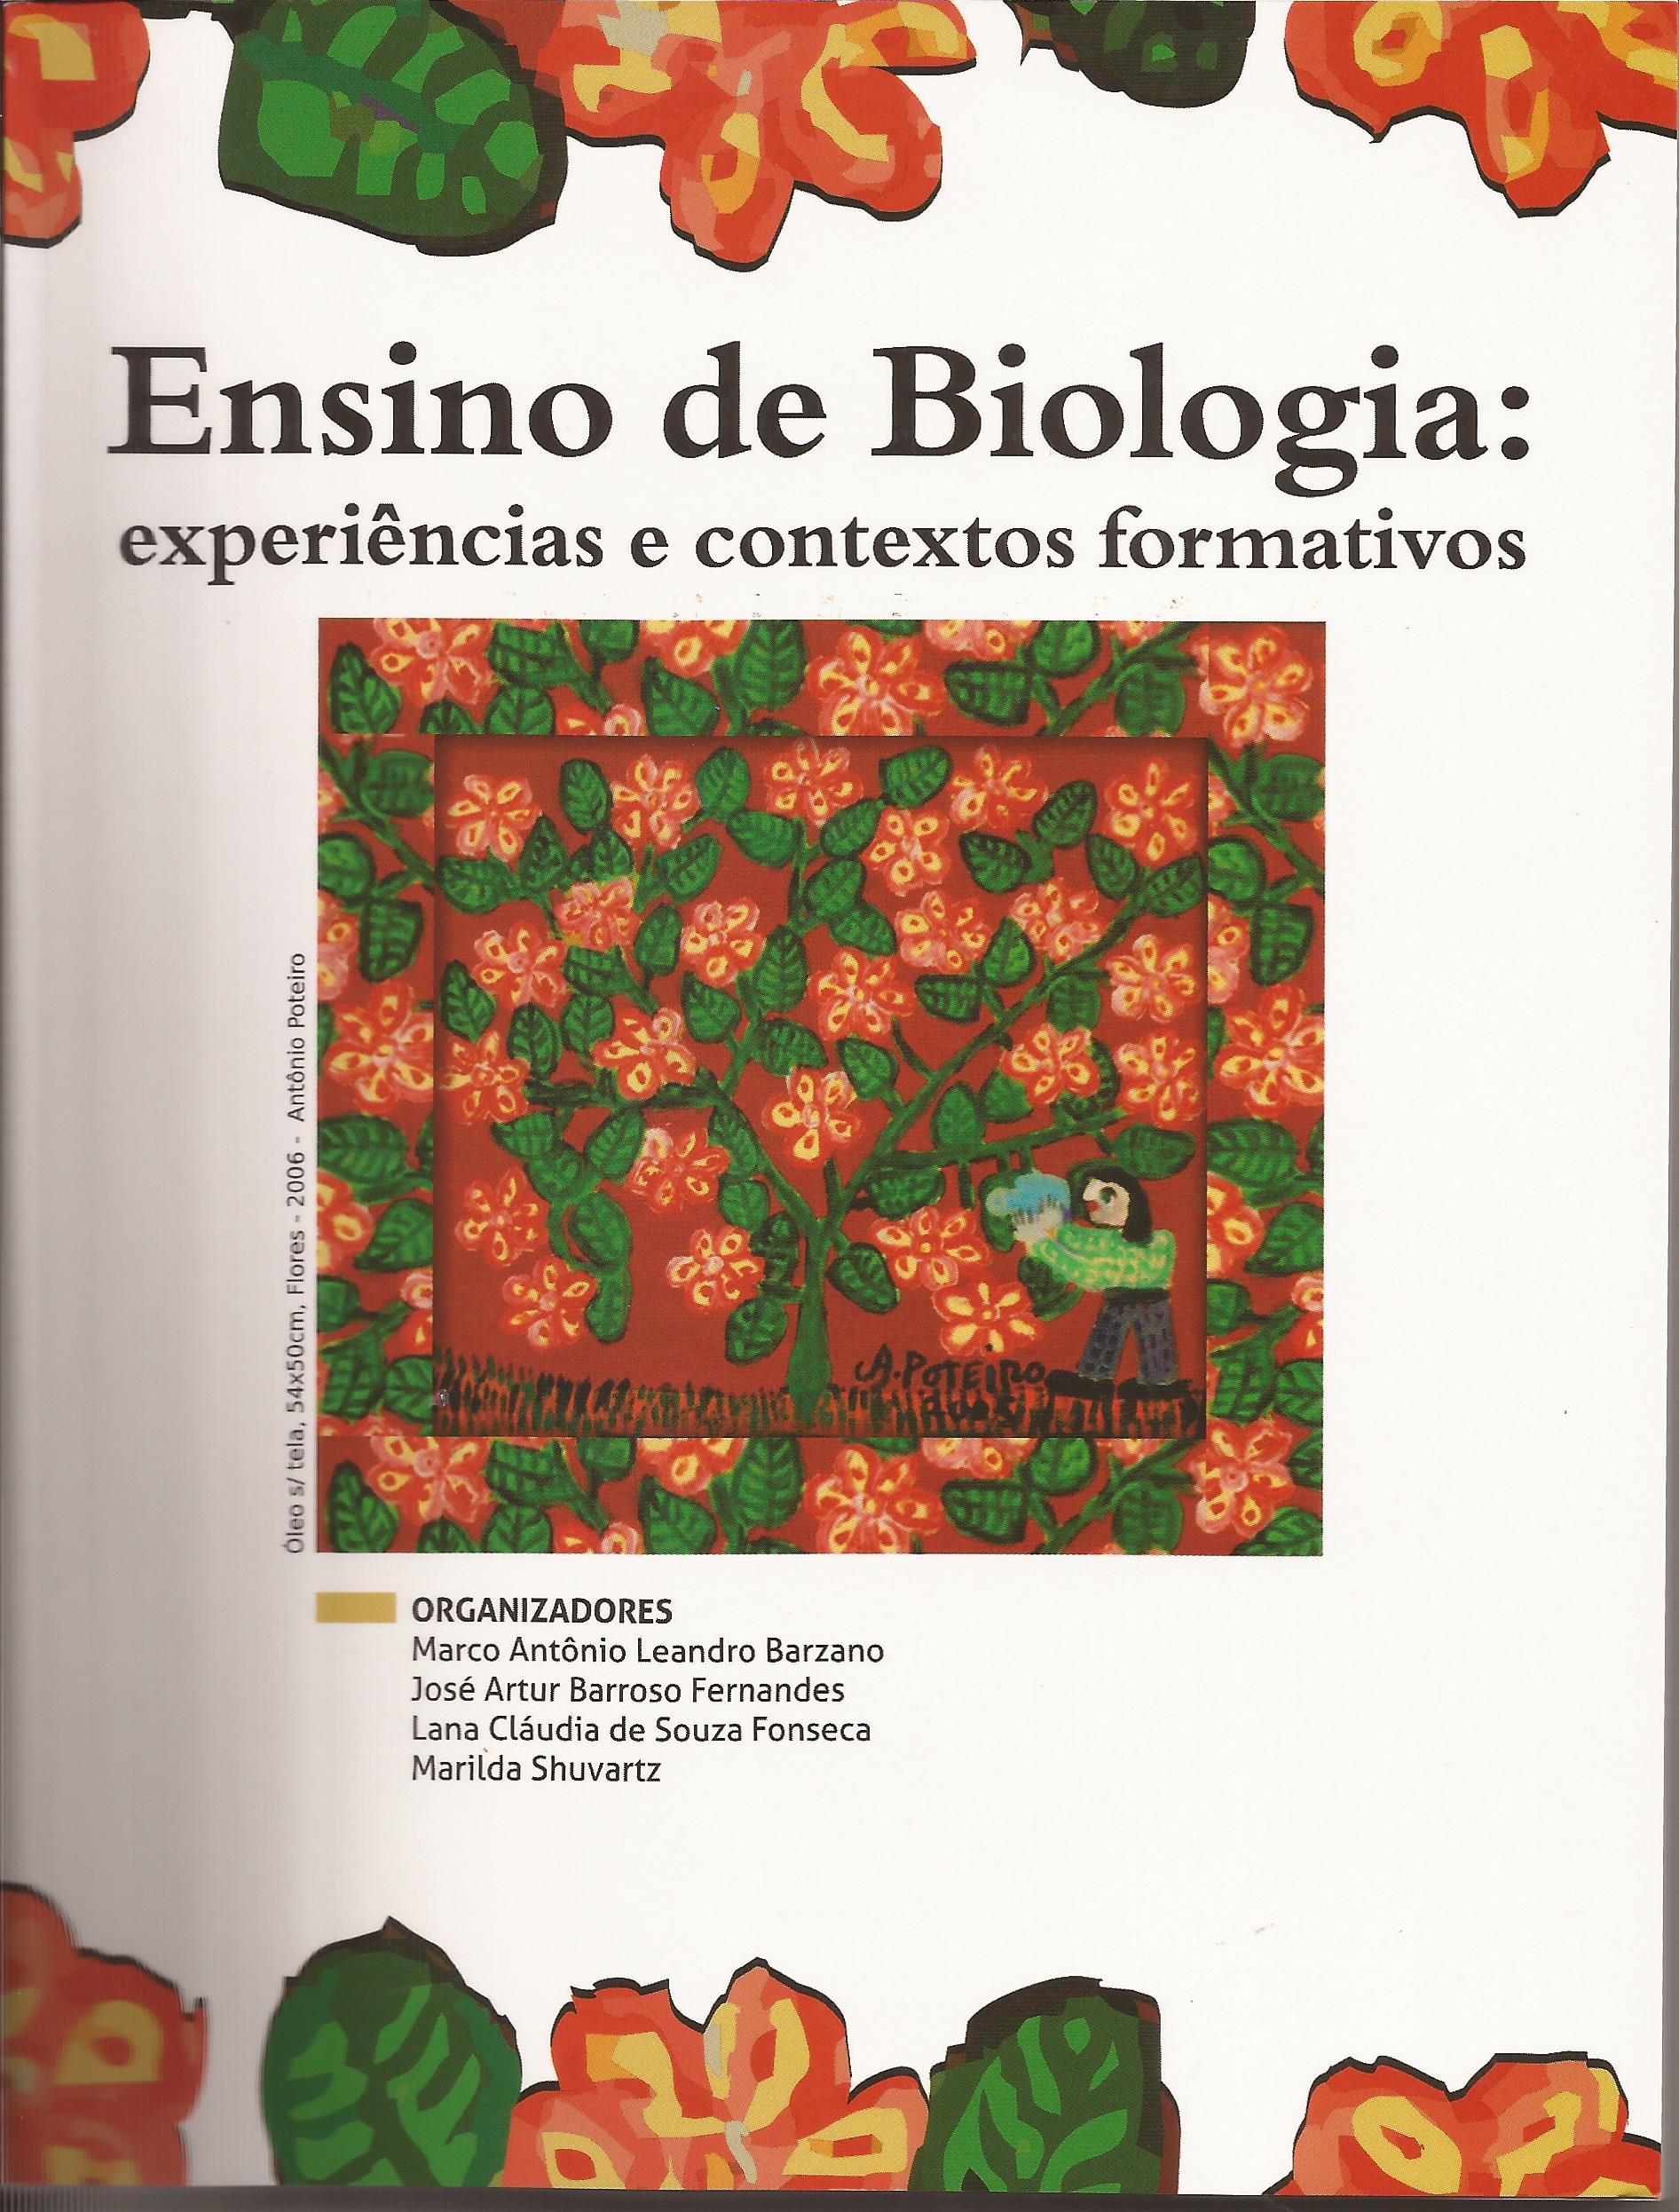 Ensino de Biologia: experiências e contextos formativos